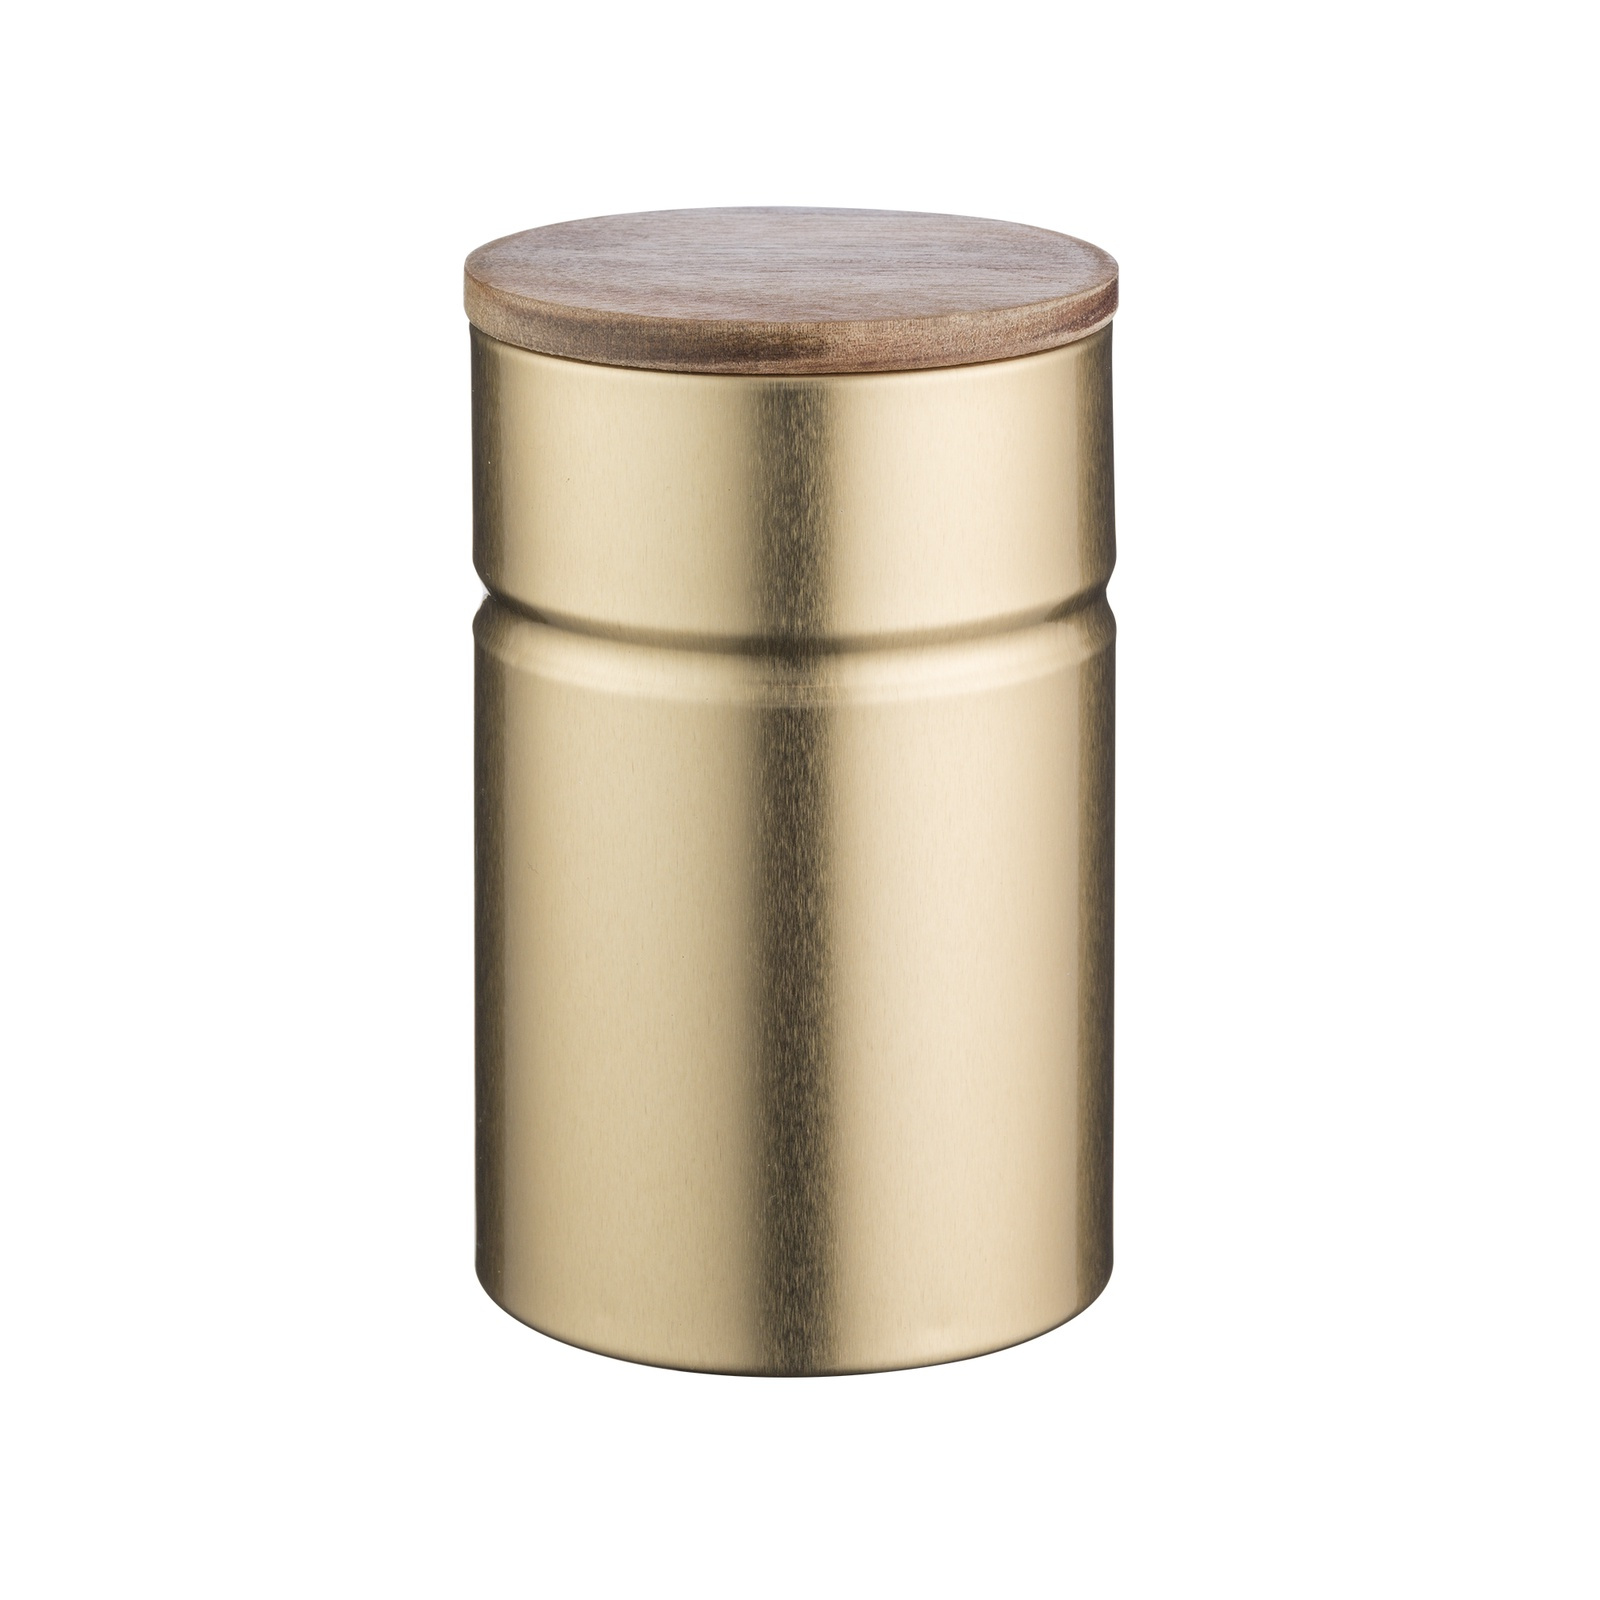 Банка для сыпучих продуктов TYPHOON Modern Kitchen 0,9 л